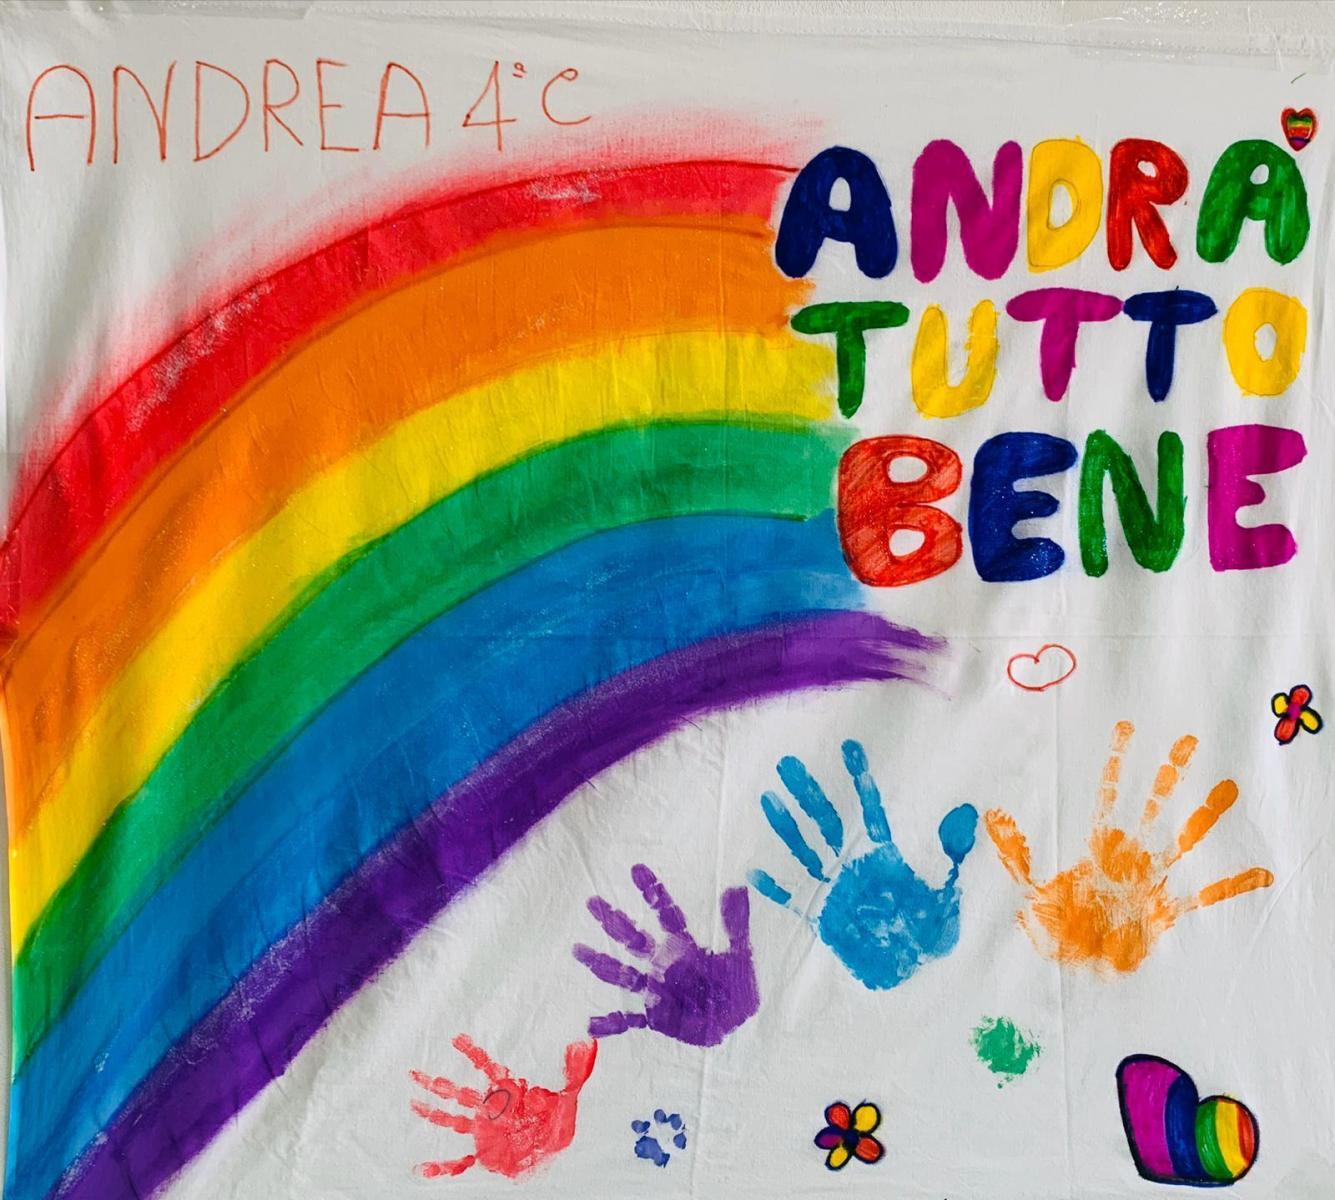 Andrea D'Angelo